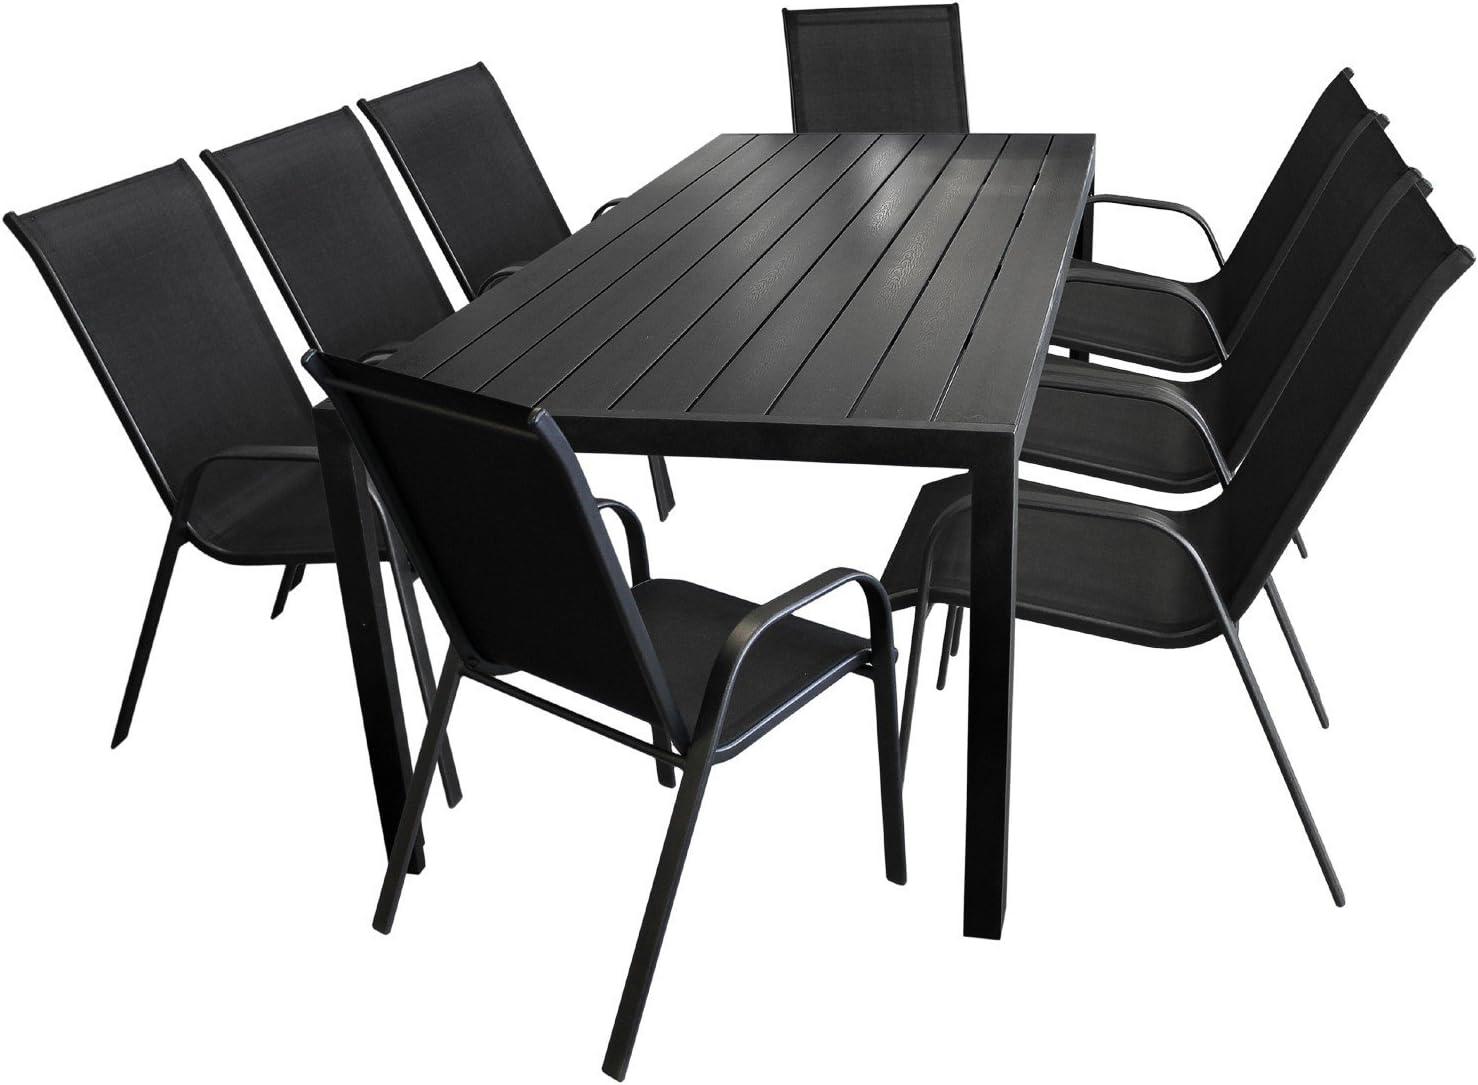 Wohaga 9tlg. Gartengarnitur Gartentisch 'Berlin', Aluminium, Polywood-Tischplatte, 200x90cm 8X Stapelstuhl, Textilengewebe/Gartenmöbel Schwarz